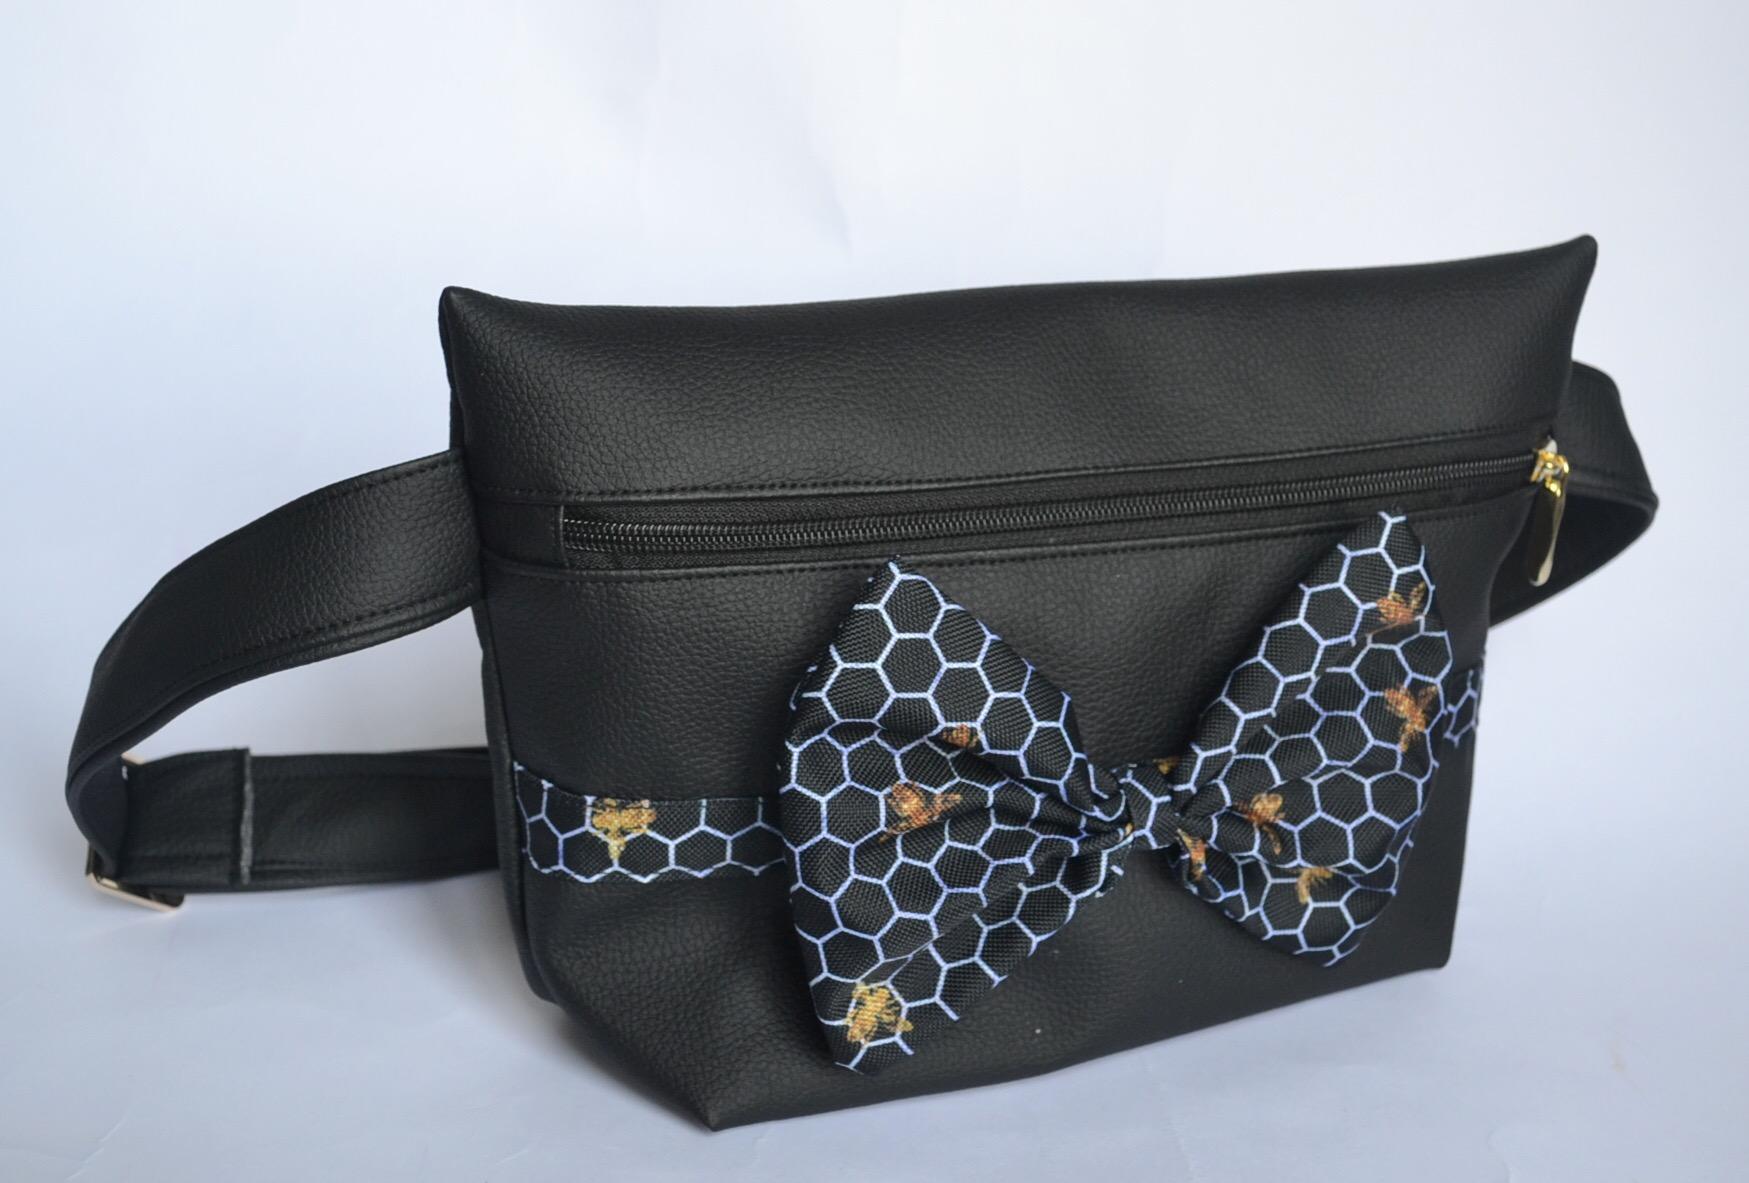 banana sac noir nid d'abeille